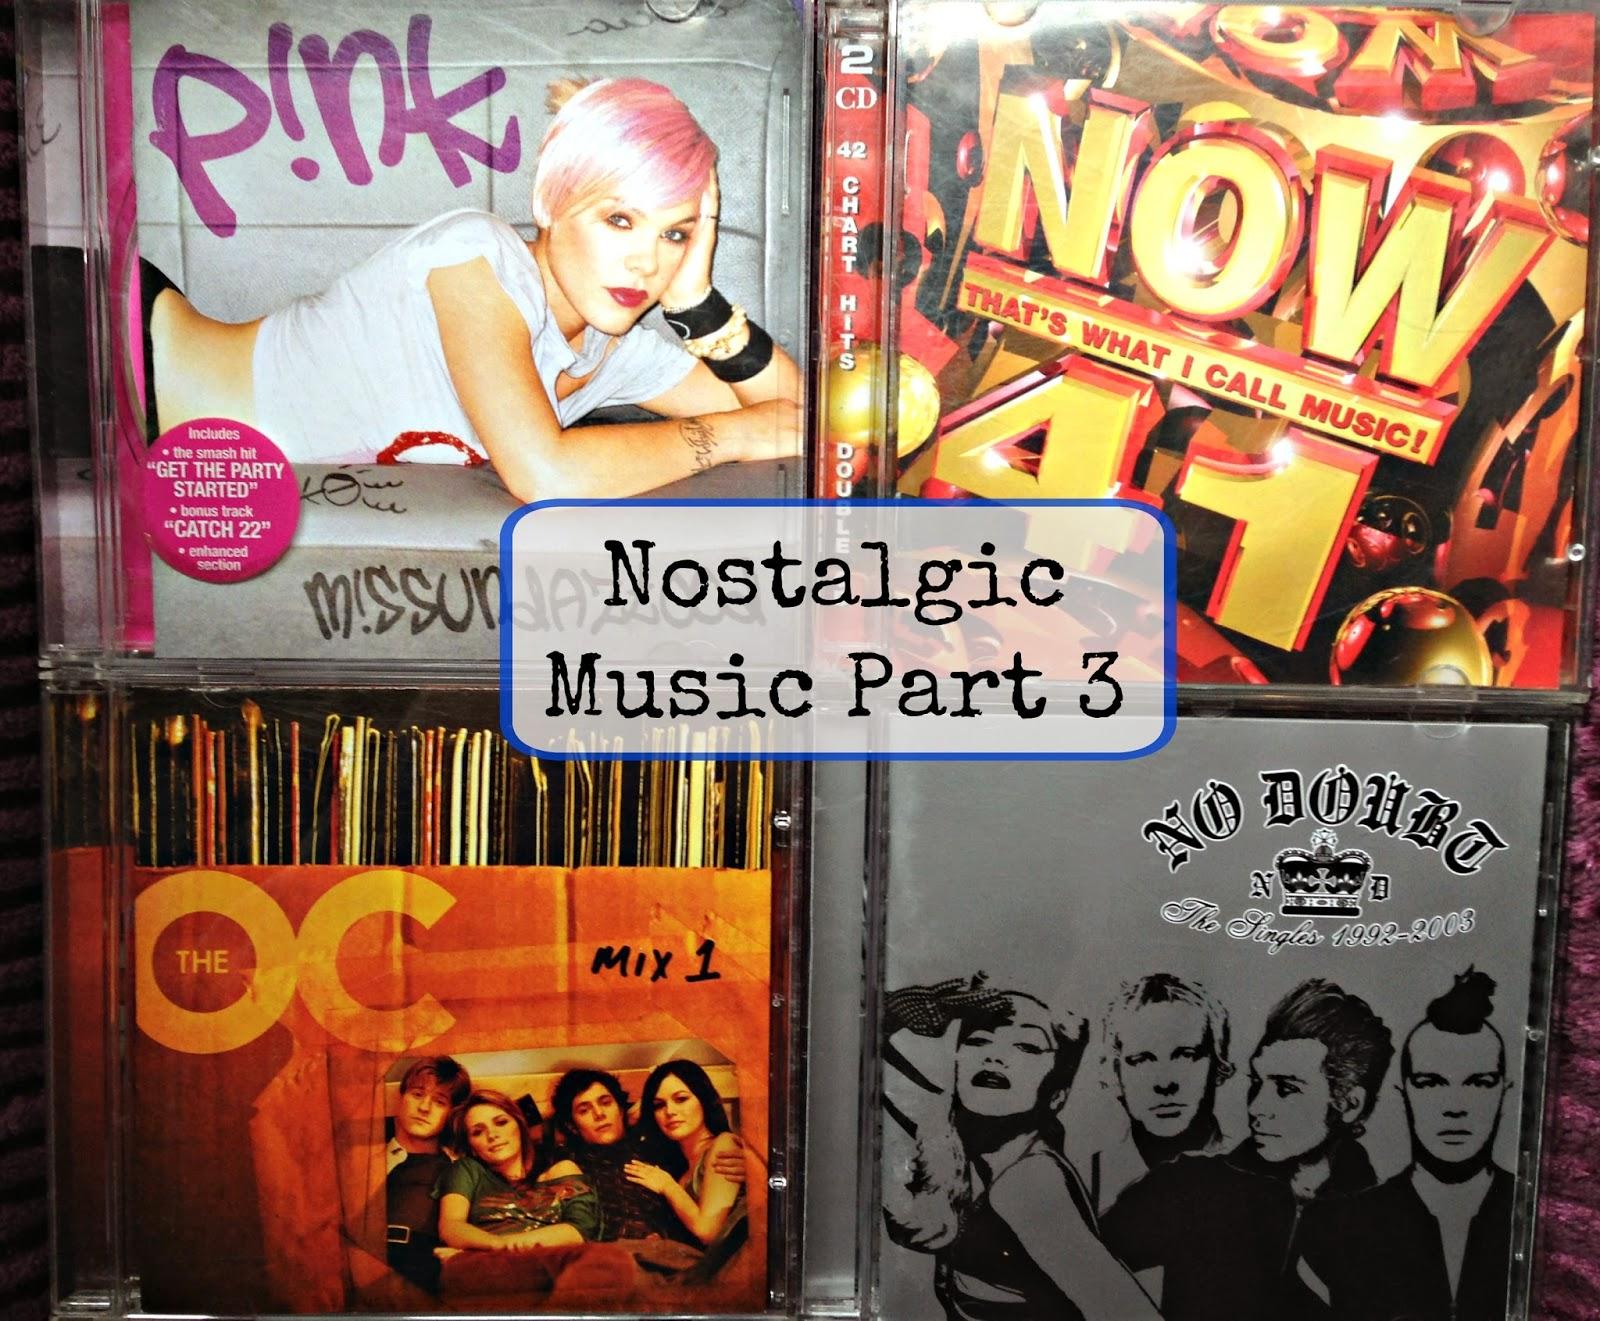 Nostalgic Music Part 3